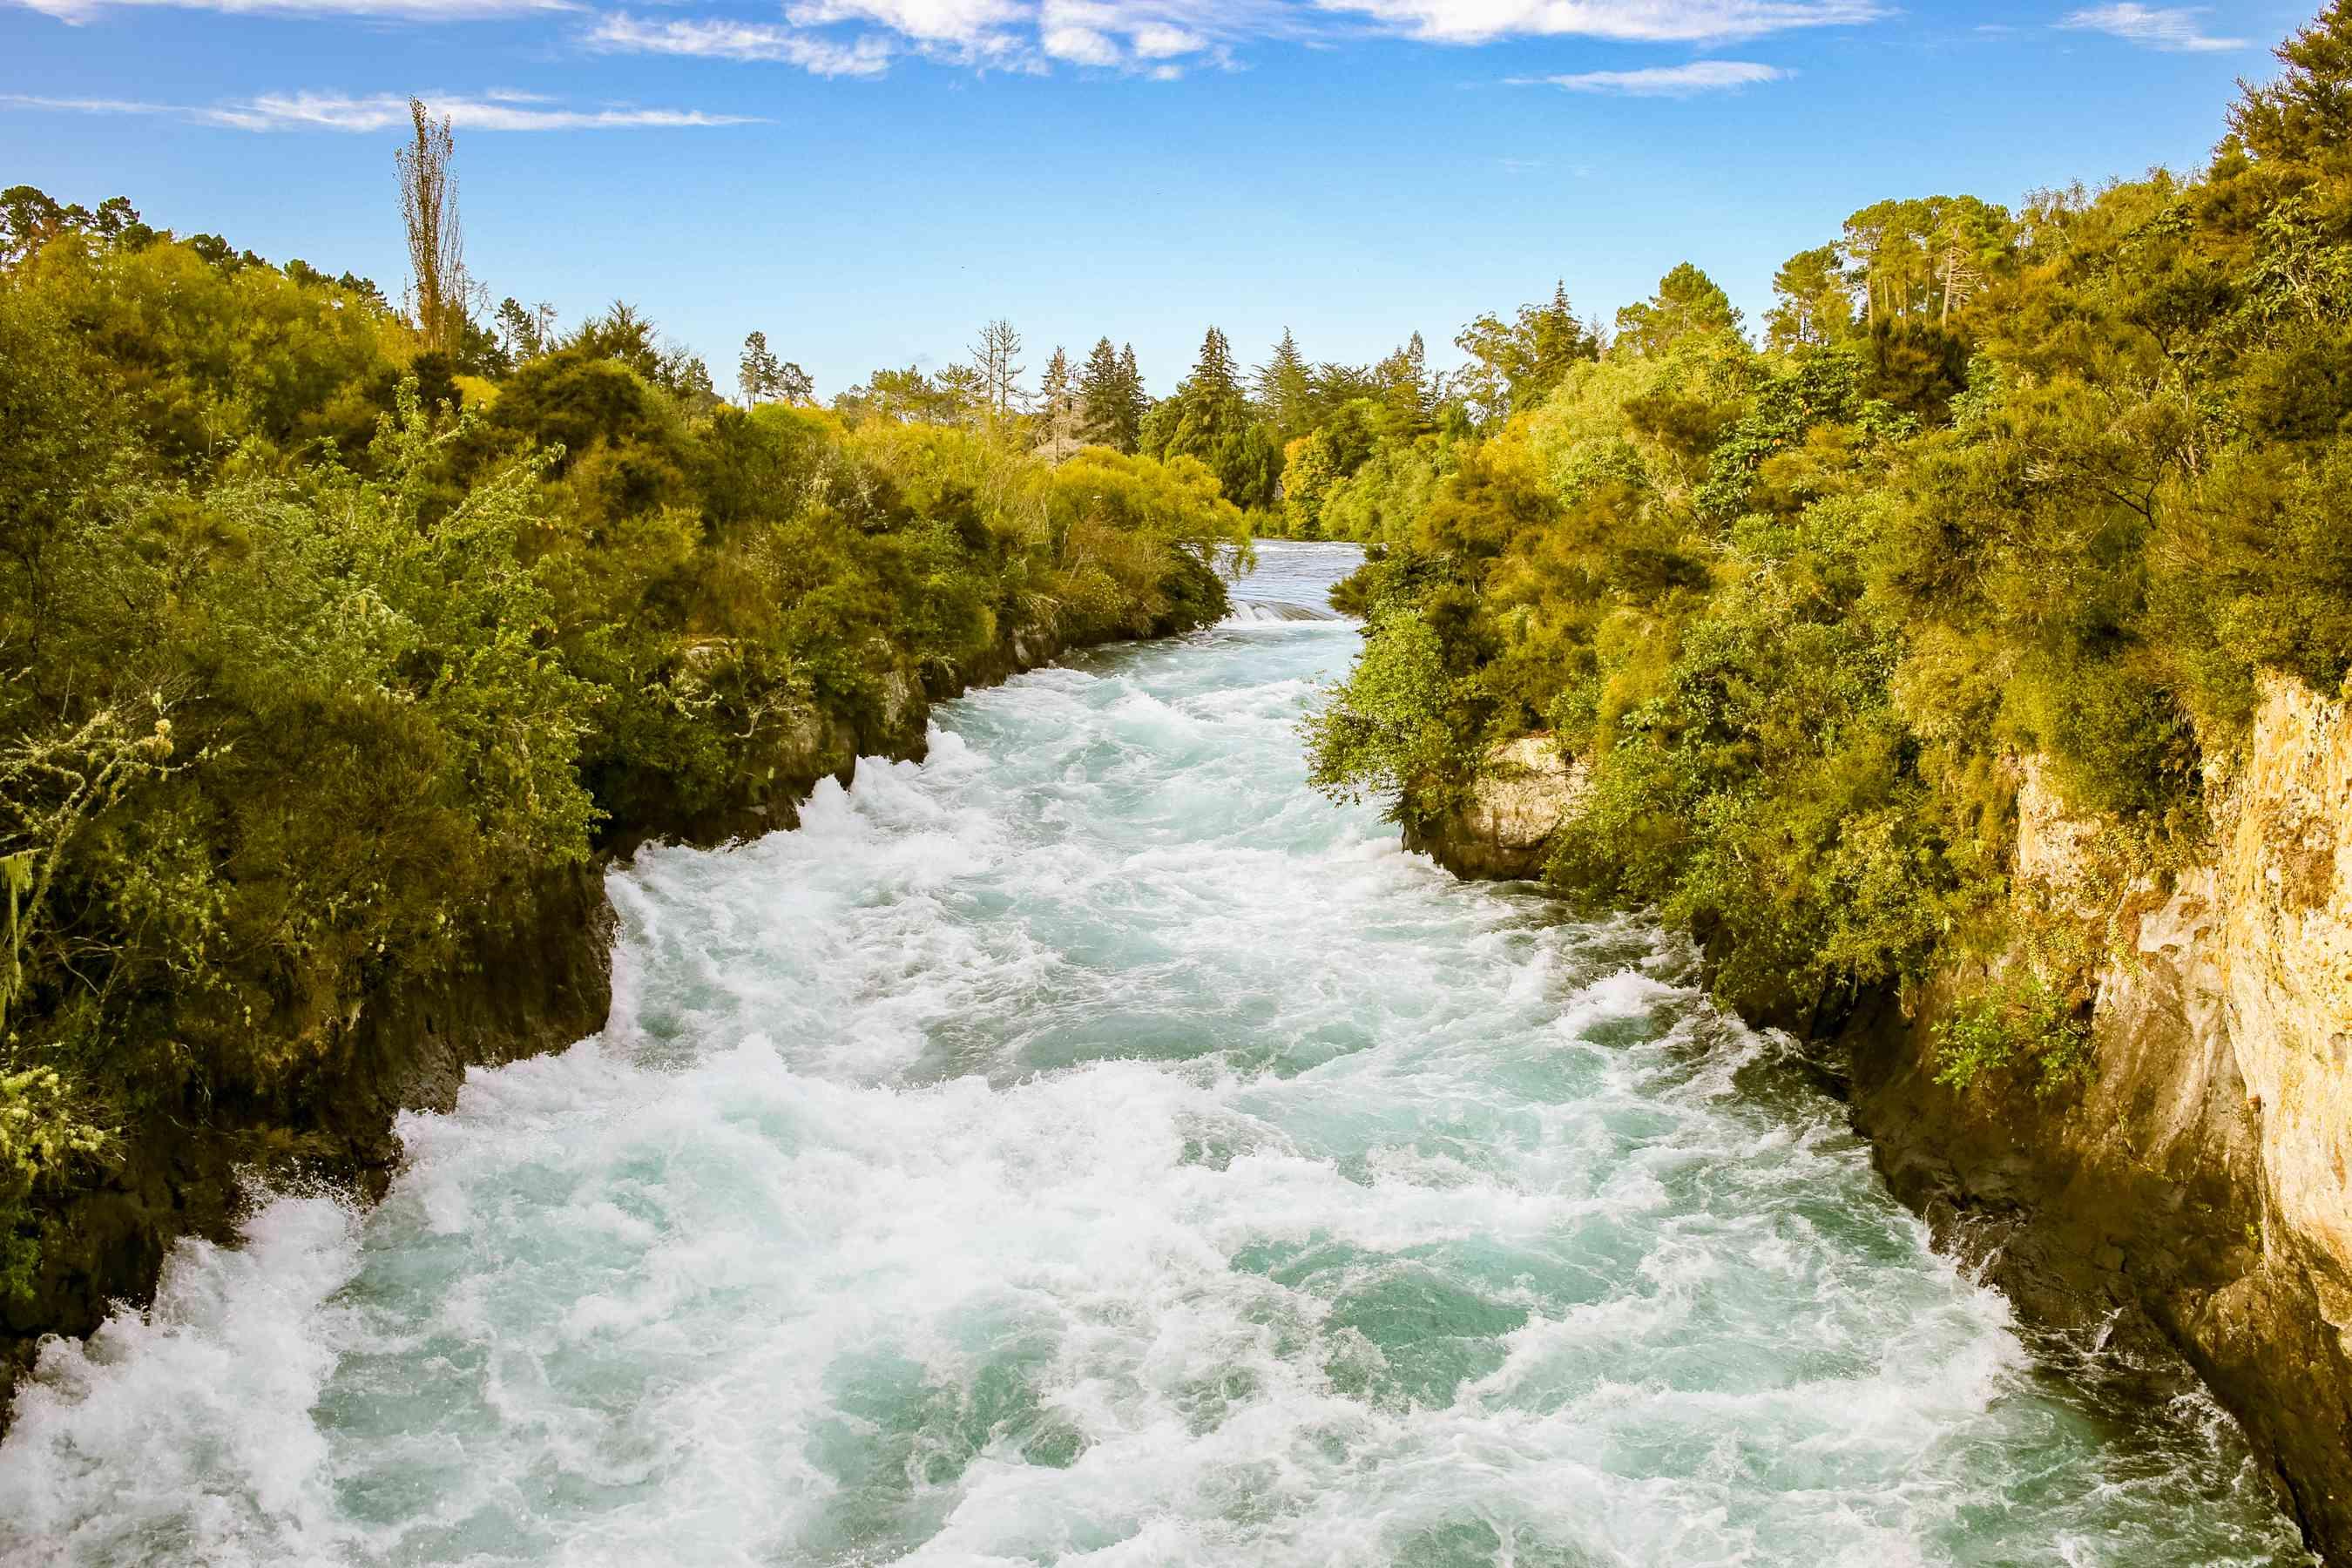 Roaring waters in Huka Falls